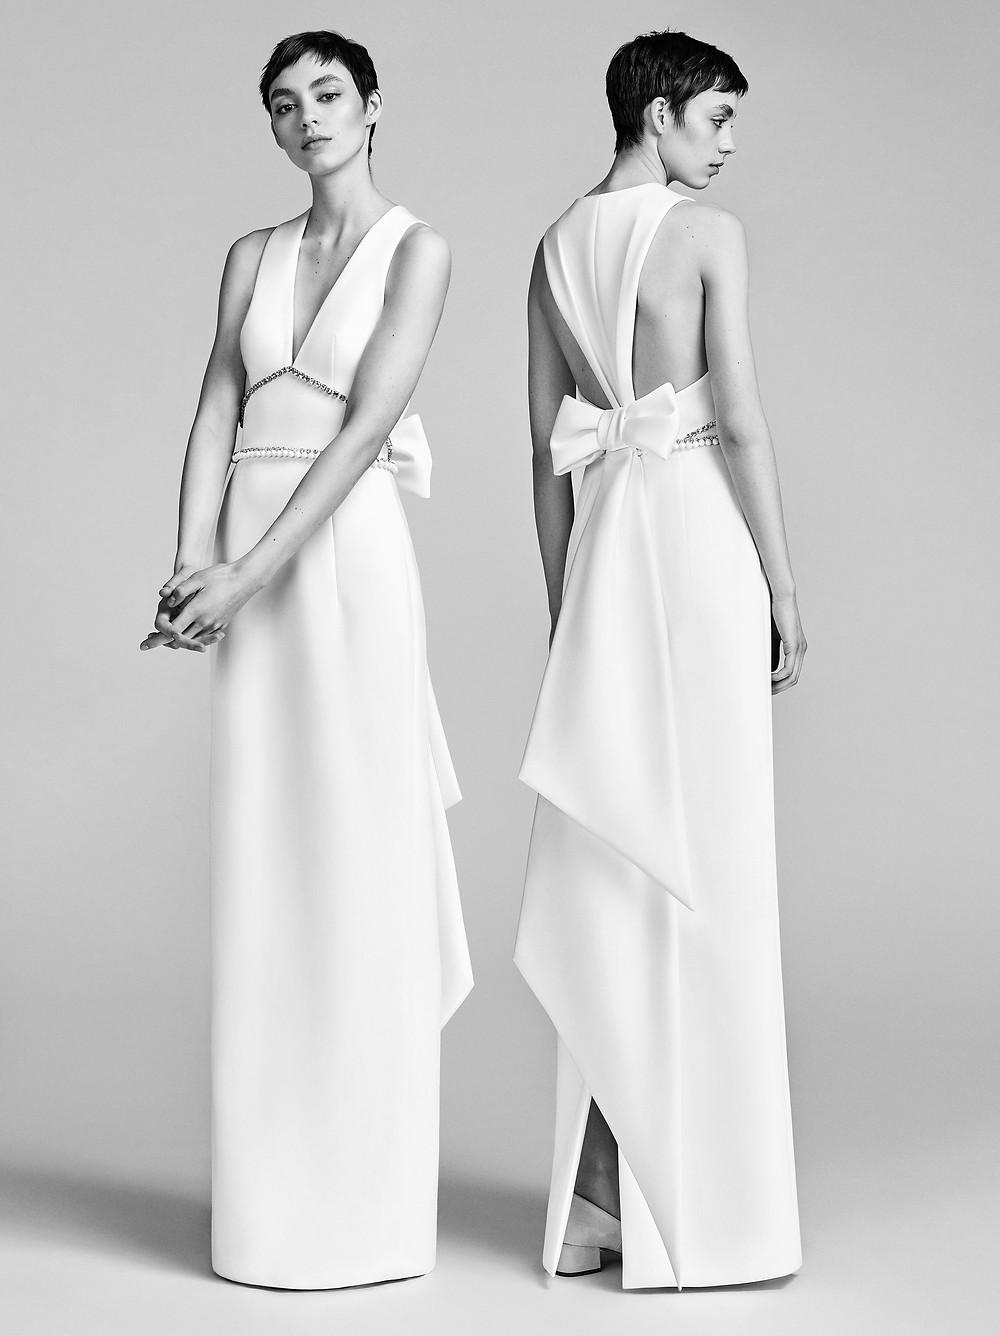 A Viktor & Rolf crepe column wedding dress with a v neckline and a bow